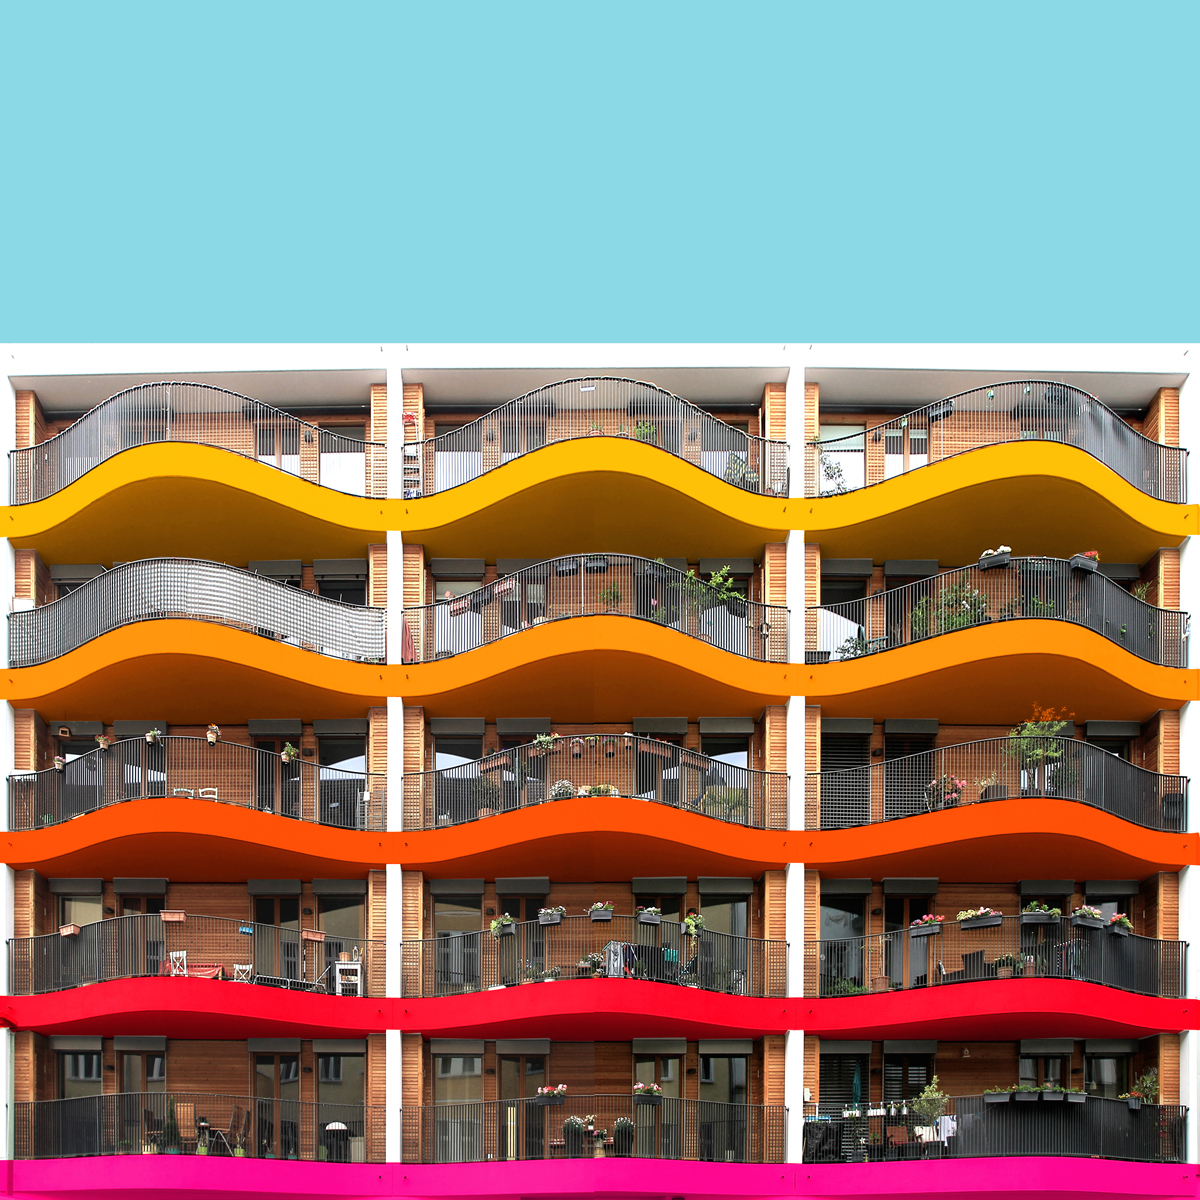 paul-eis-farbe-architektur2